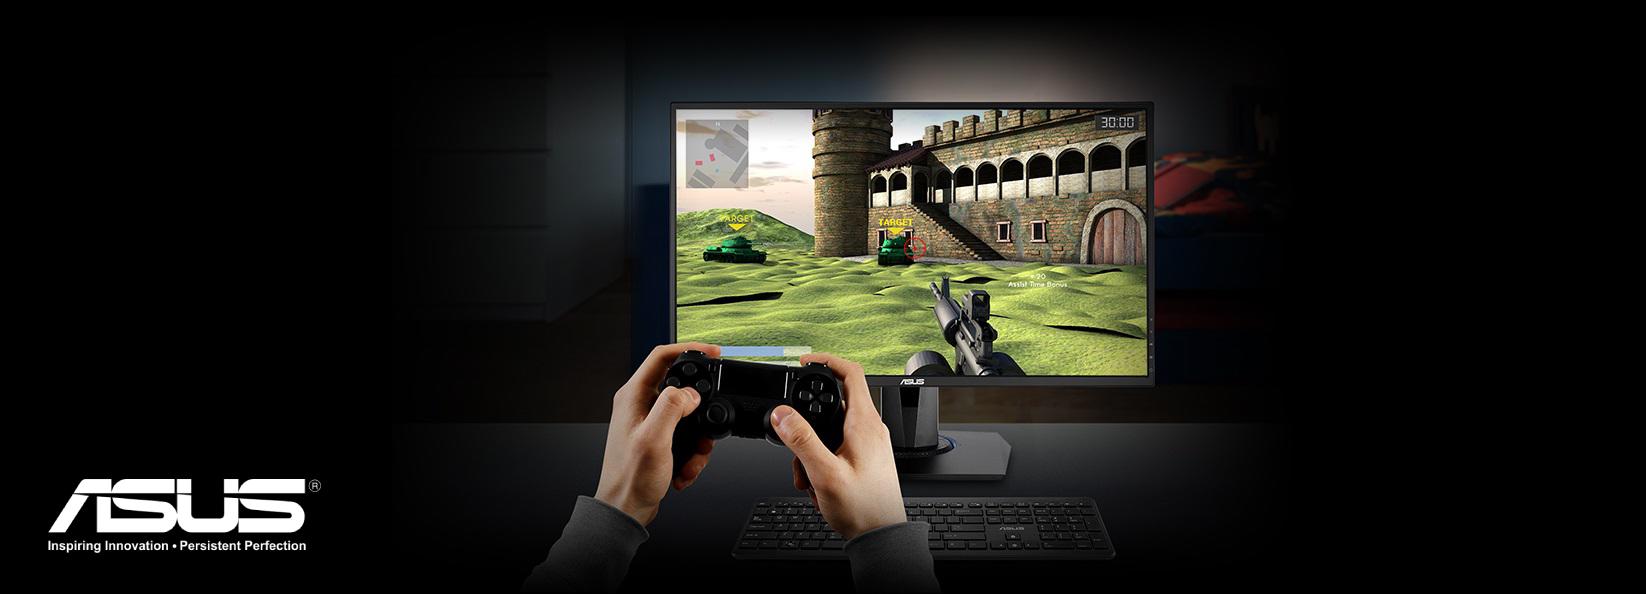 ASUS VG278Q Gaming Monitor - 27inch, Full HD, 1ms, 144Hz, G